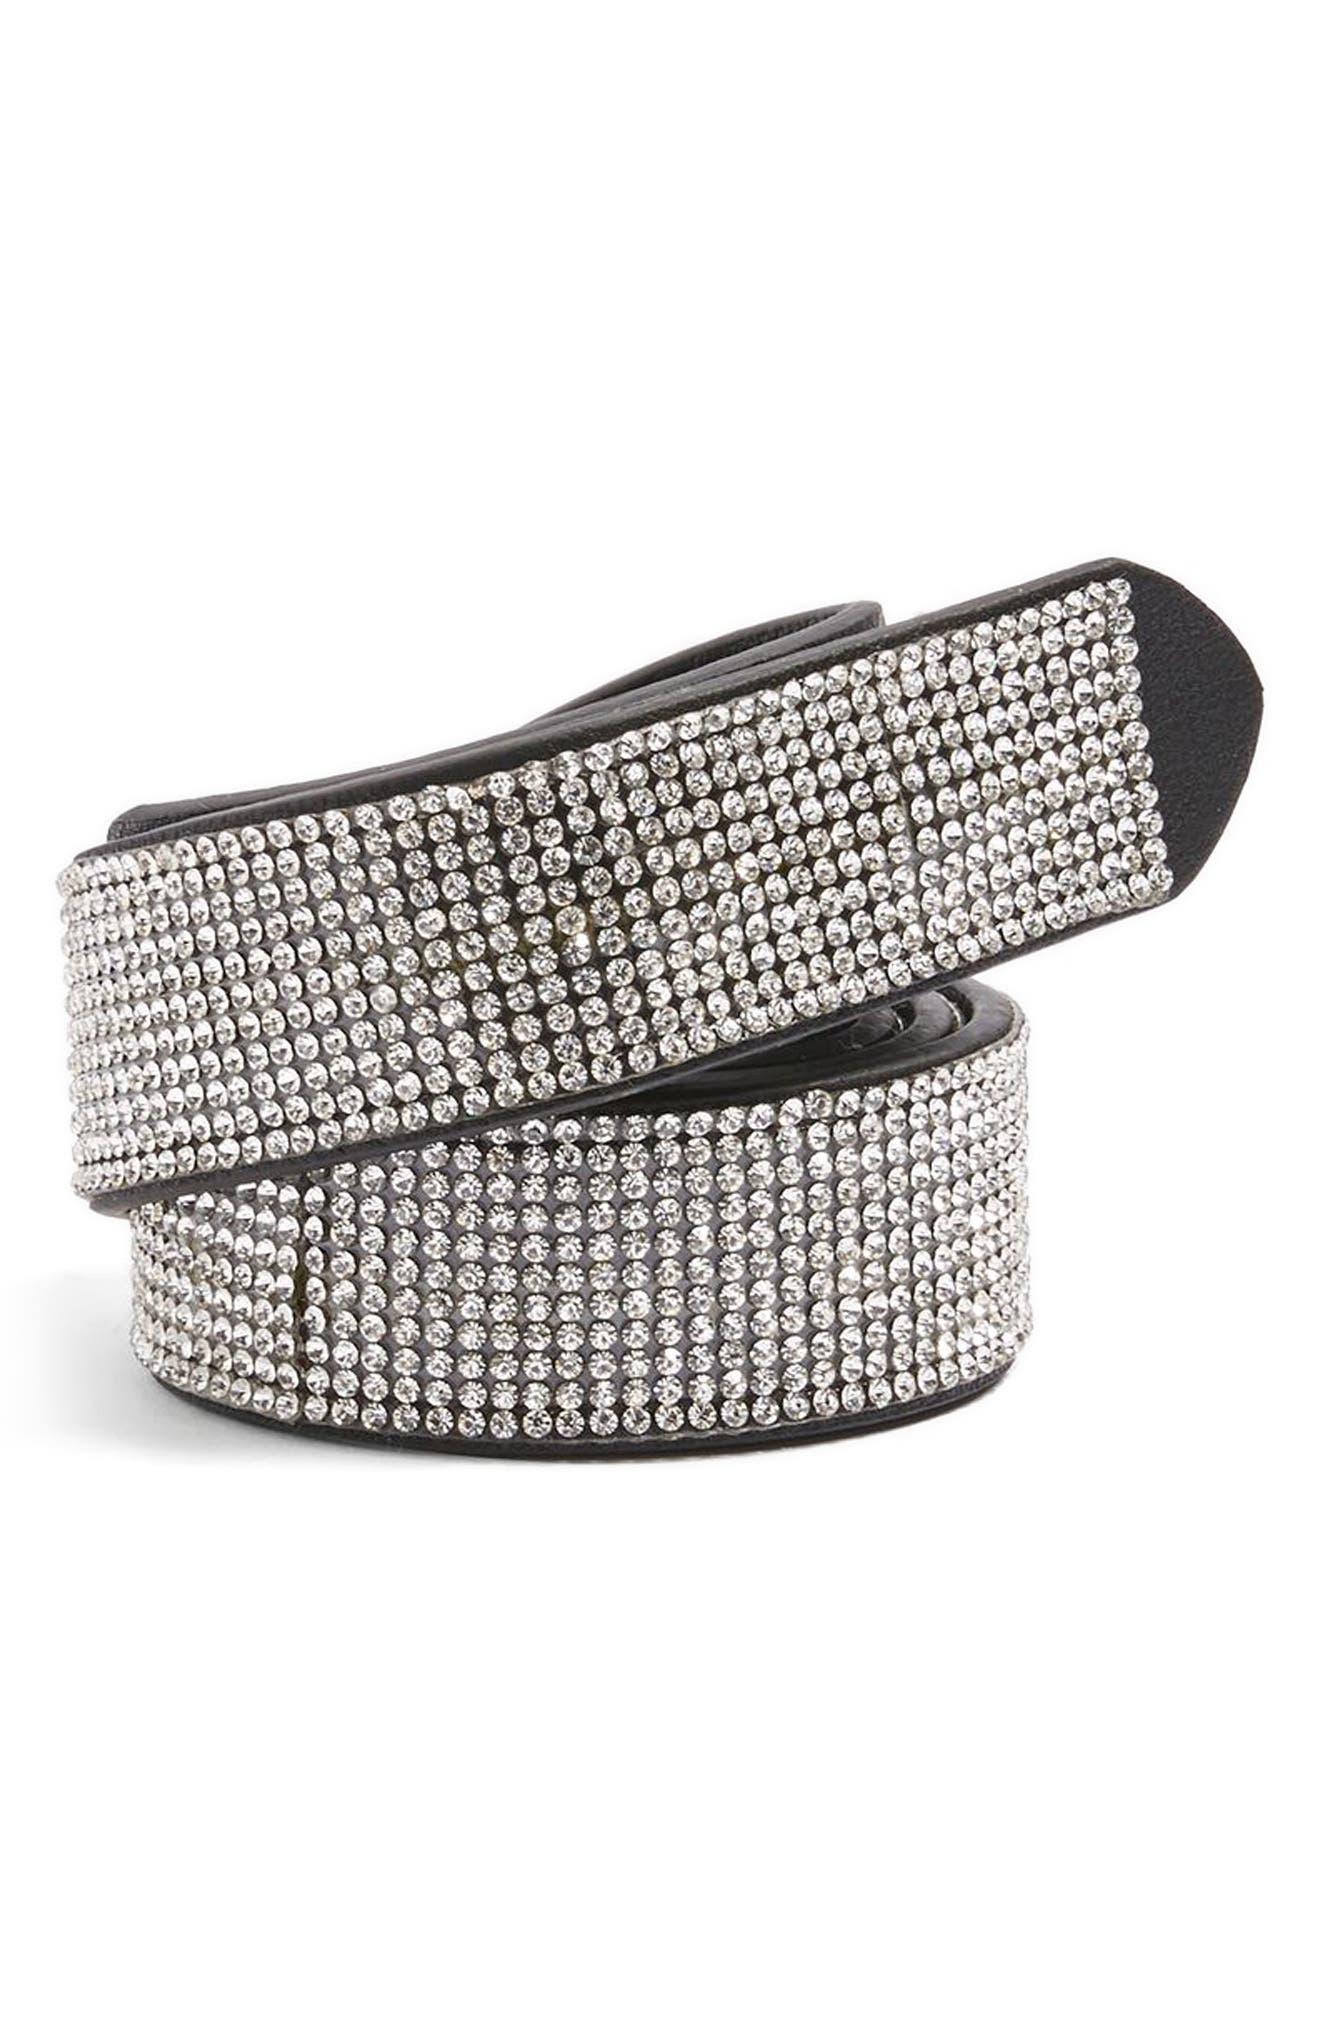 Alternate Image 1 Selected - Topshop Diamante Belt